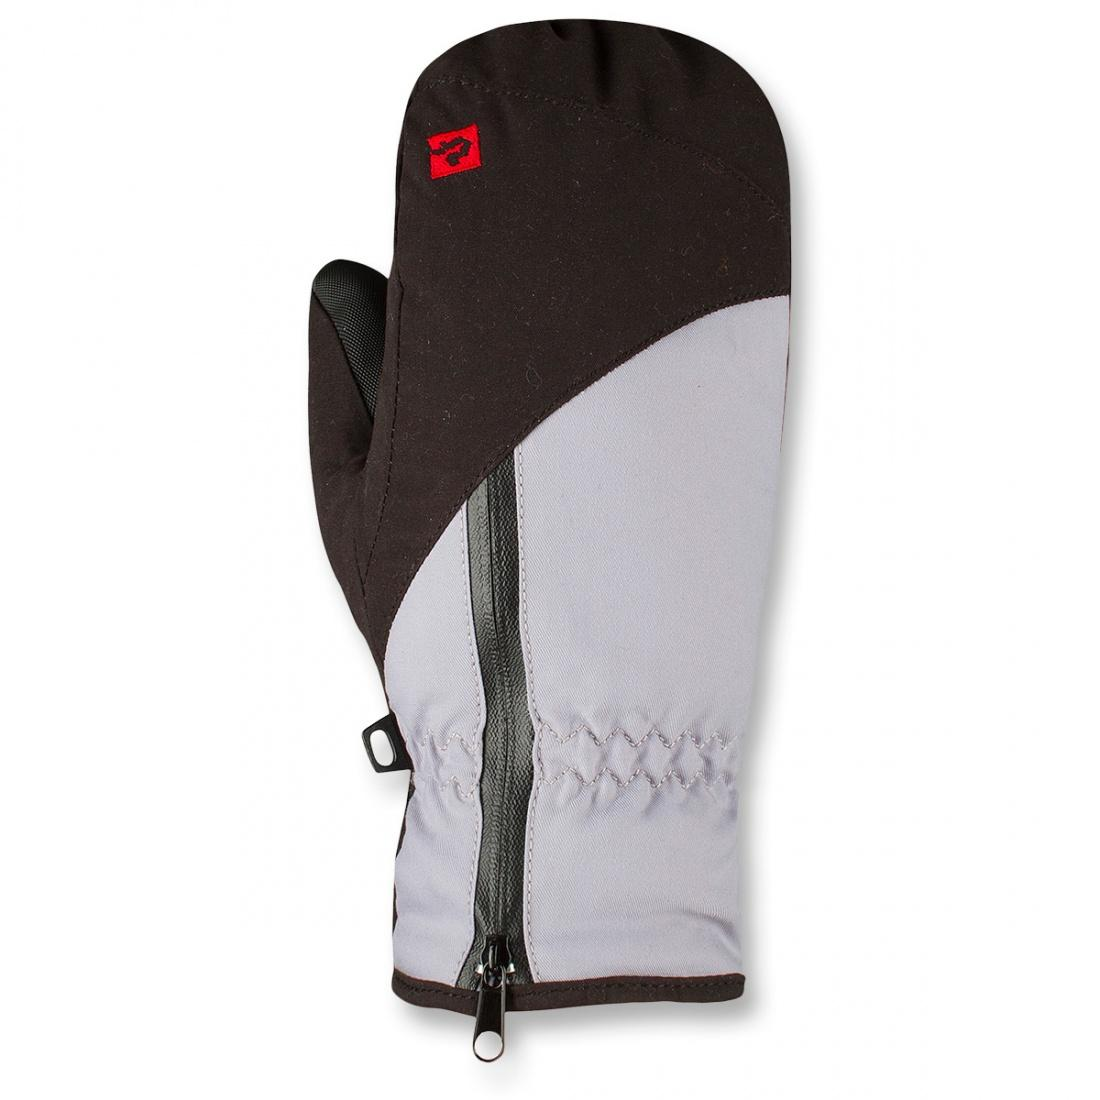 Рукавицы утепленные Traverse II ПодростковыеВарежки<br><br> Прогулочные утепленные рукавицы с ярким дизайном.<br><br><br><br><br><br>Материал – 50% Polyester, 50% Nylon, 156 g/sqm.<br>Усиление – 80% Polyvinyl Chloride, 20% P...<br><br>Цвет: Бежевый<br>Размер: L